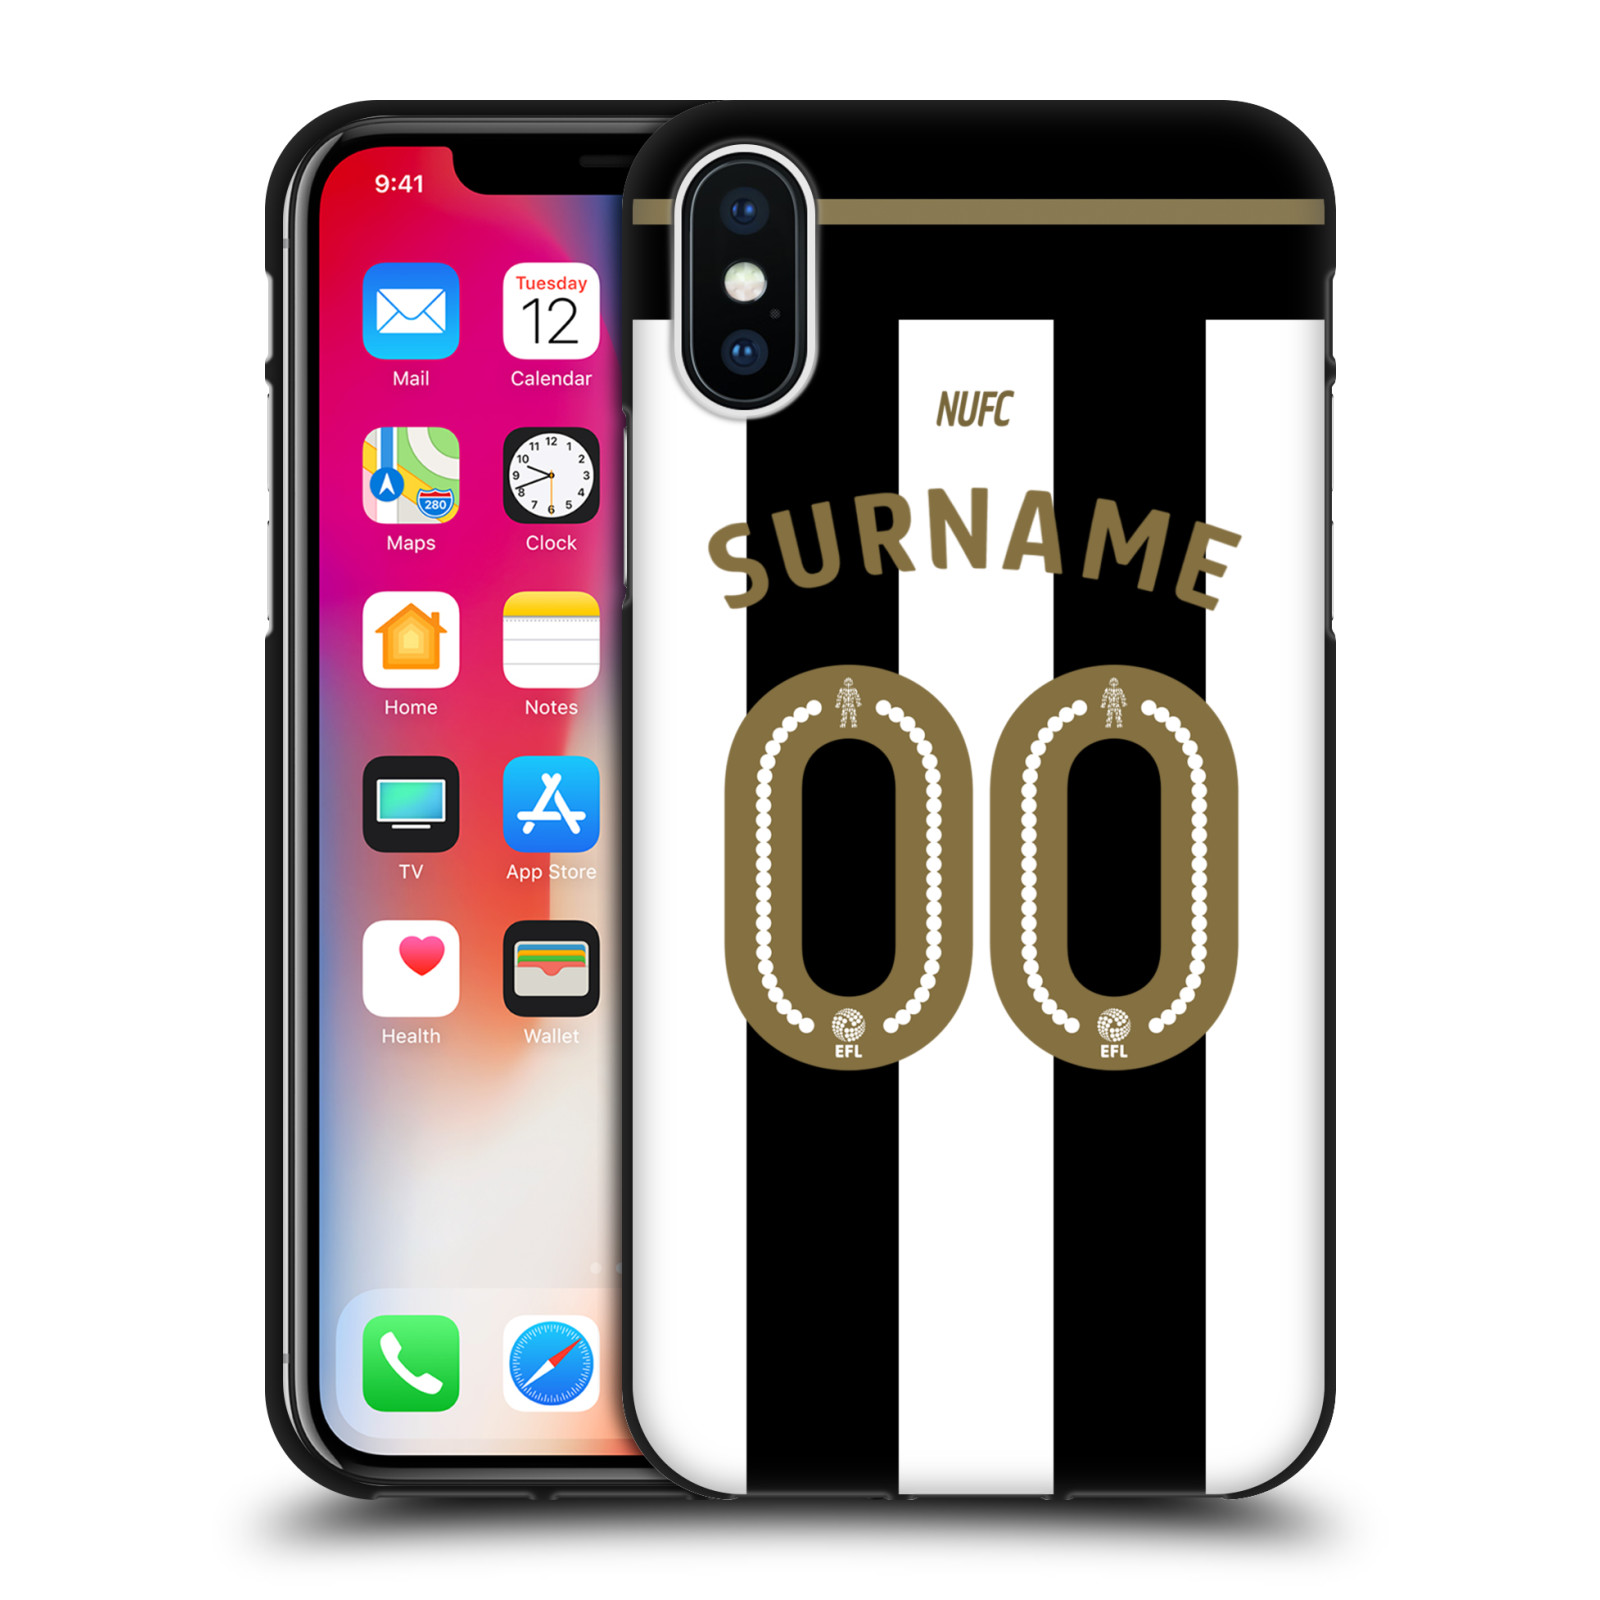 CUSTOM-PERSONALISED-NUFC-2016-17-BLACK-SOFT-GEL-CASE-FOR-APPLE-iPHONE-PHONES